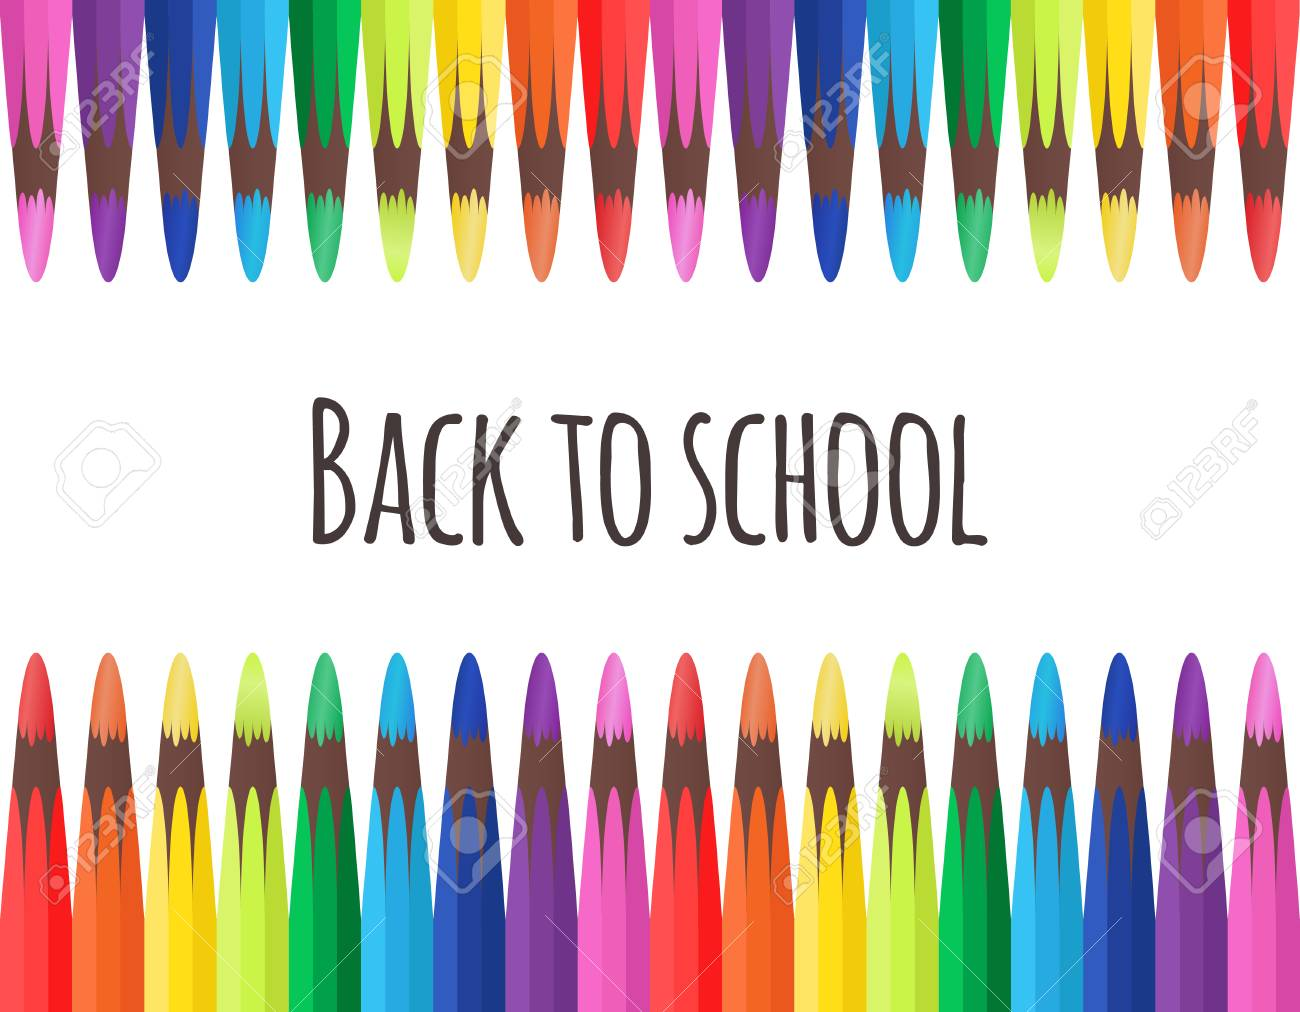 Crayons Ecole Scrap Couleurs Klipart Pinterest Make - Pencil And Paper  Cartoon Clipart (#274857) - PinClipart